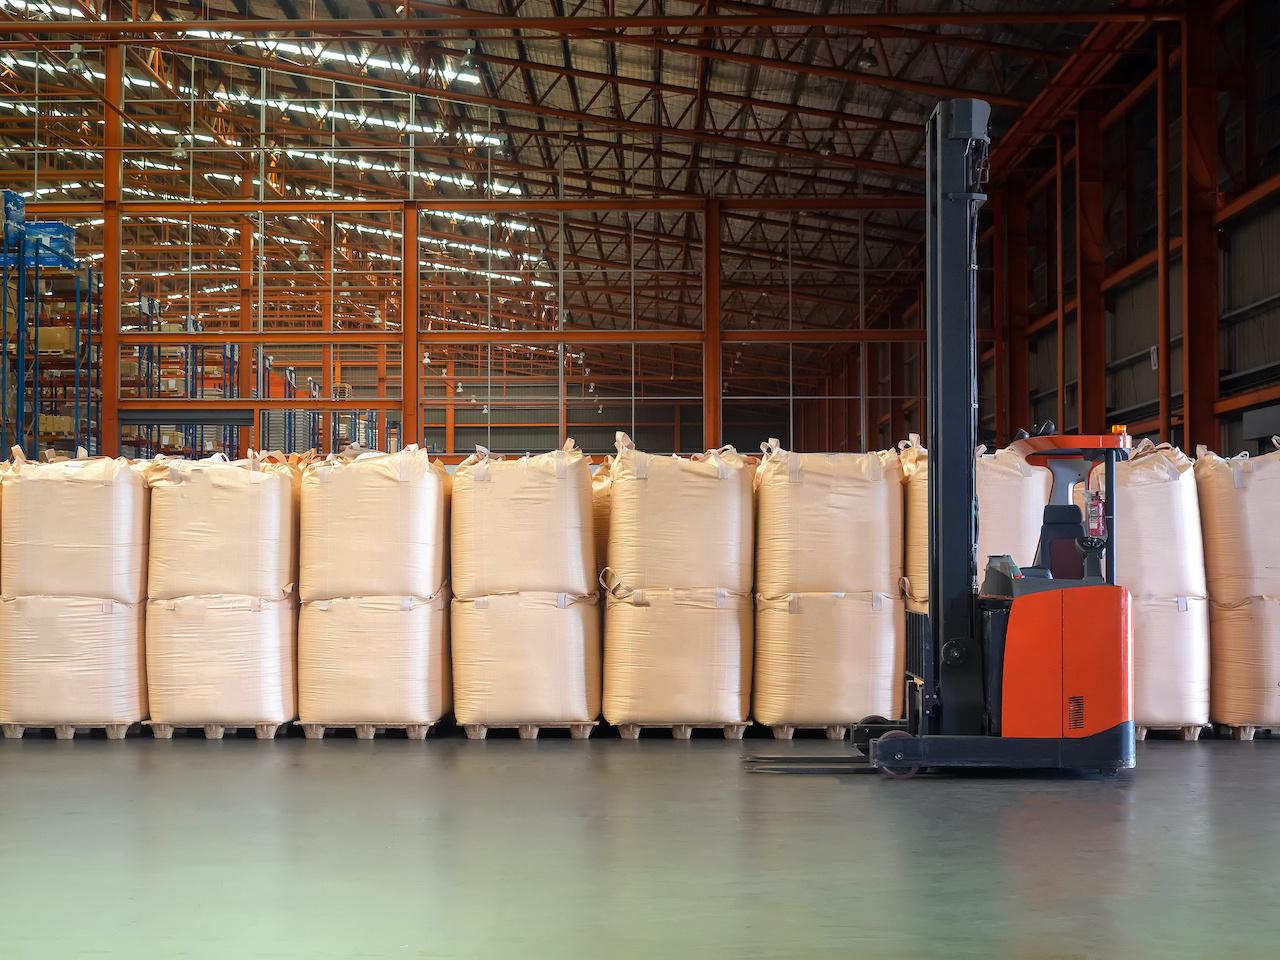 Warehouse bags